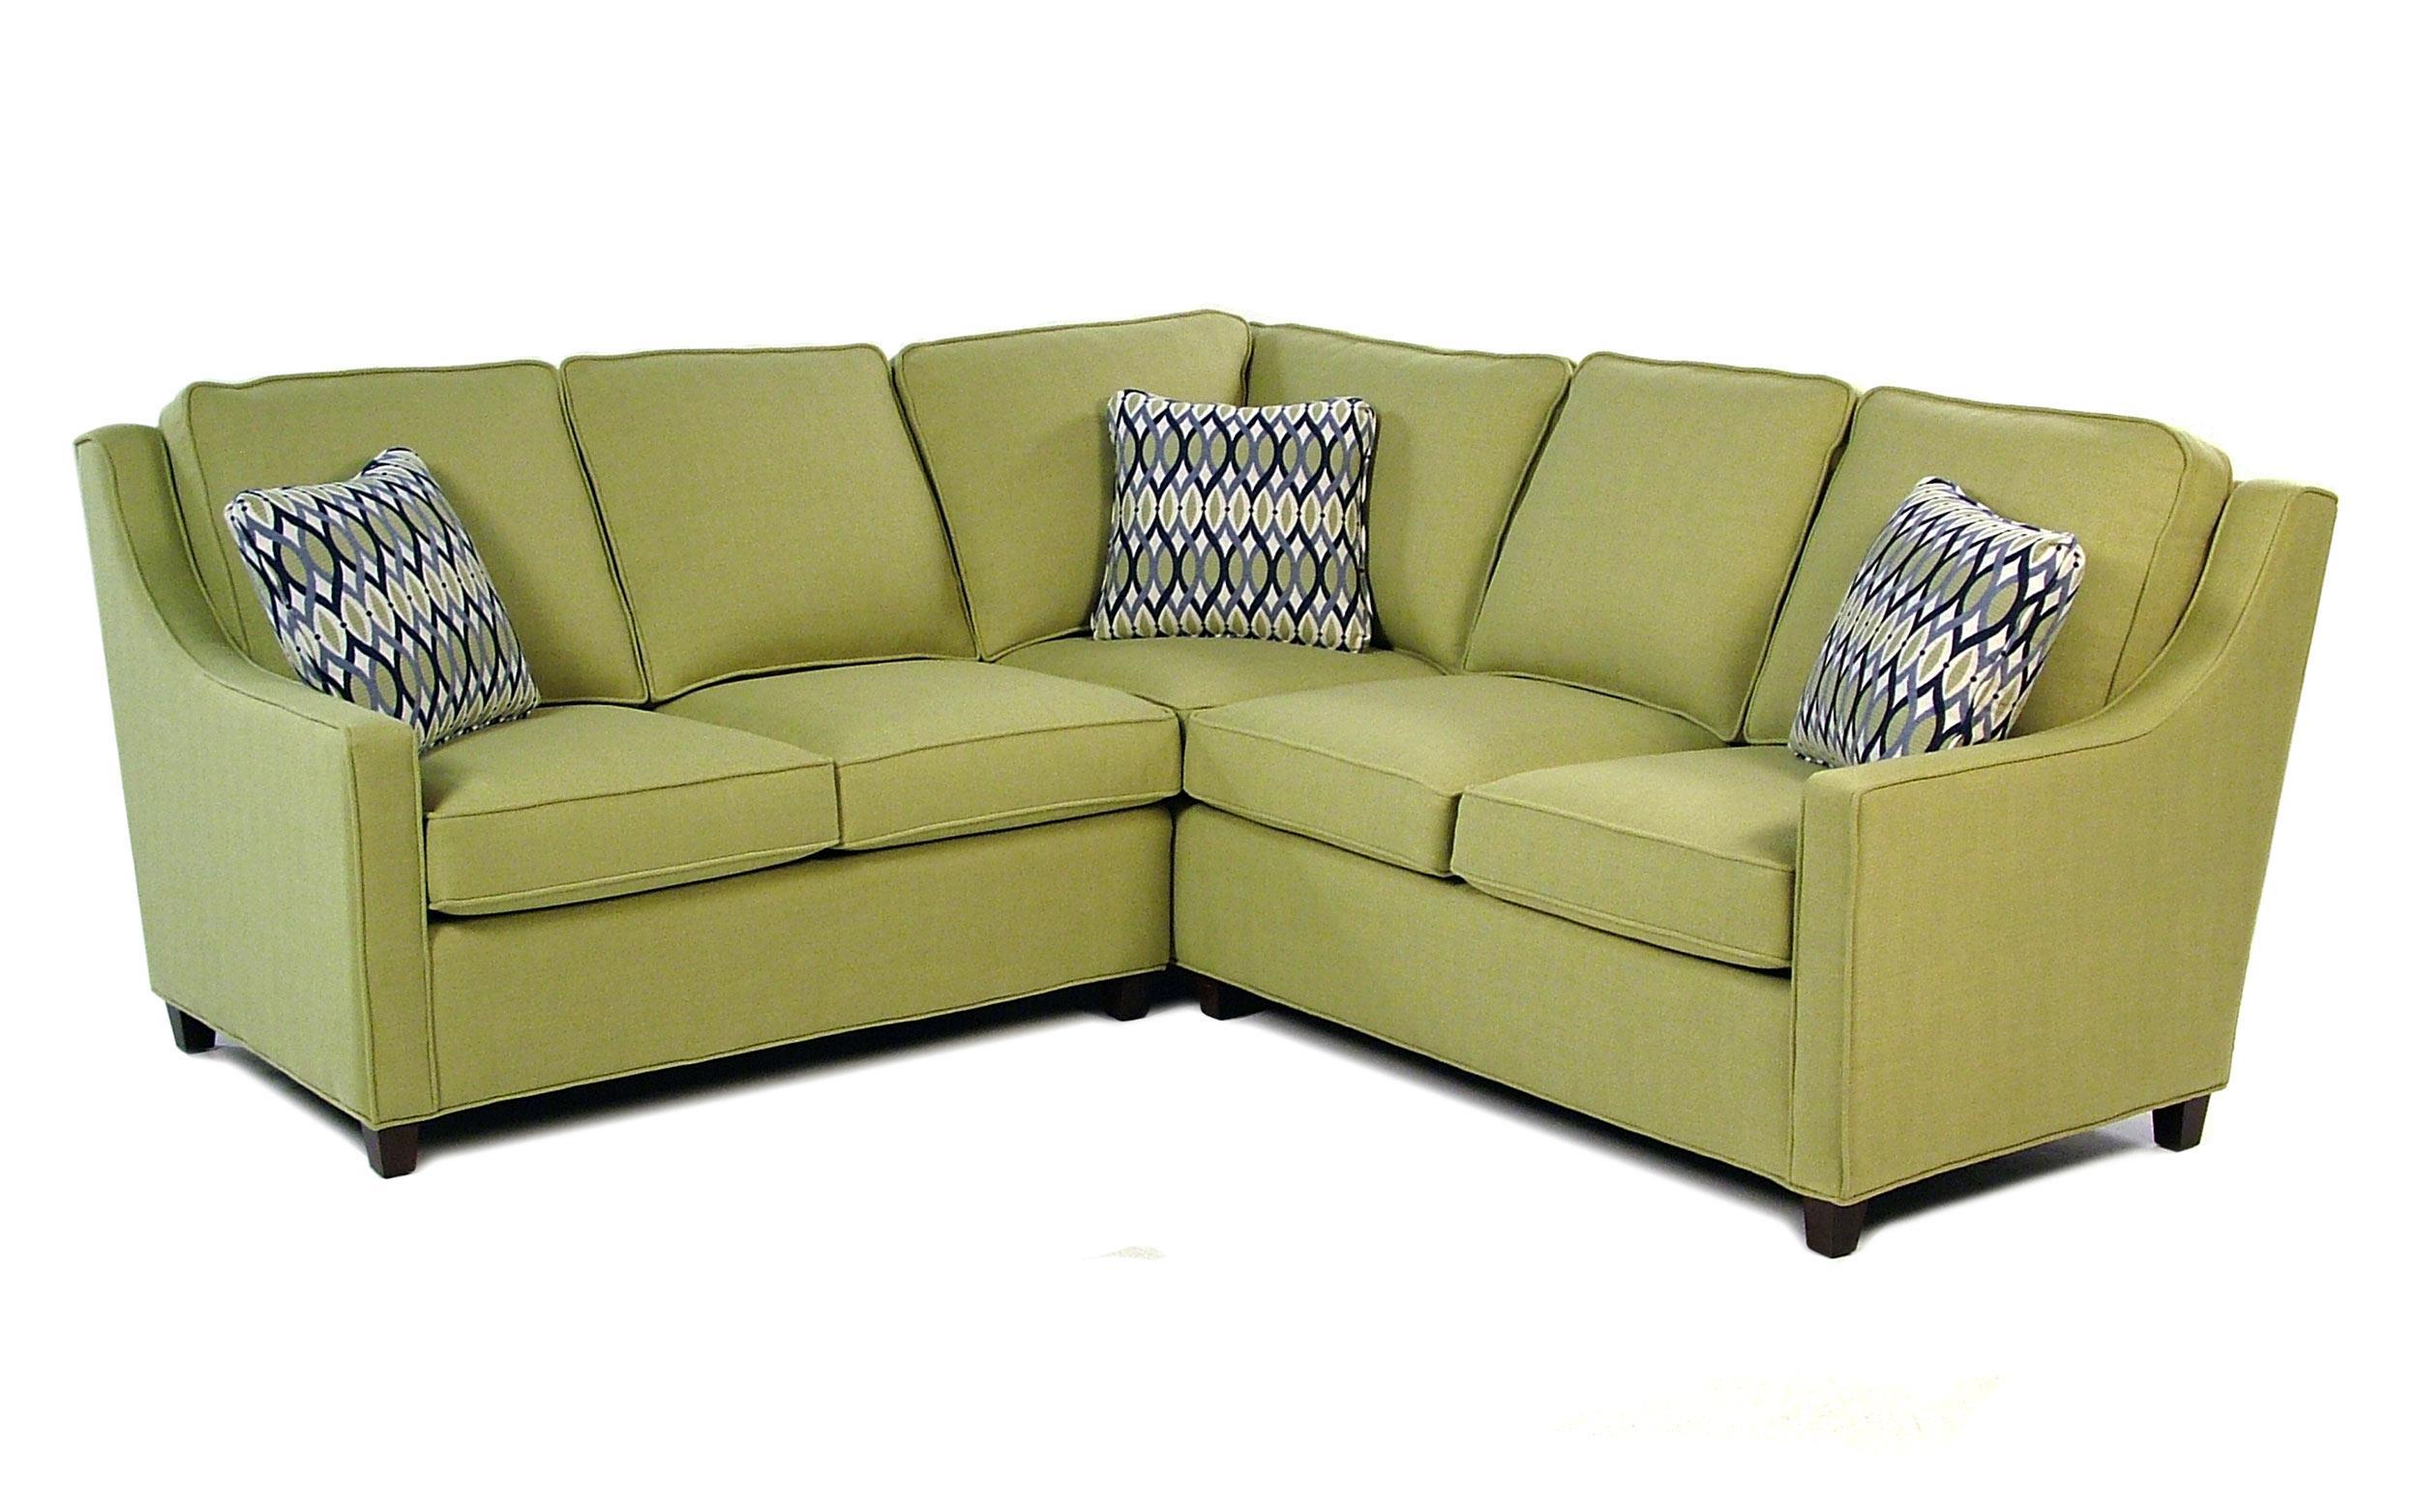 Hallagan Furniture Highland Park 2-Piece Sectional - Item Number: 44ABS-LFLS+RFD